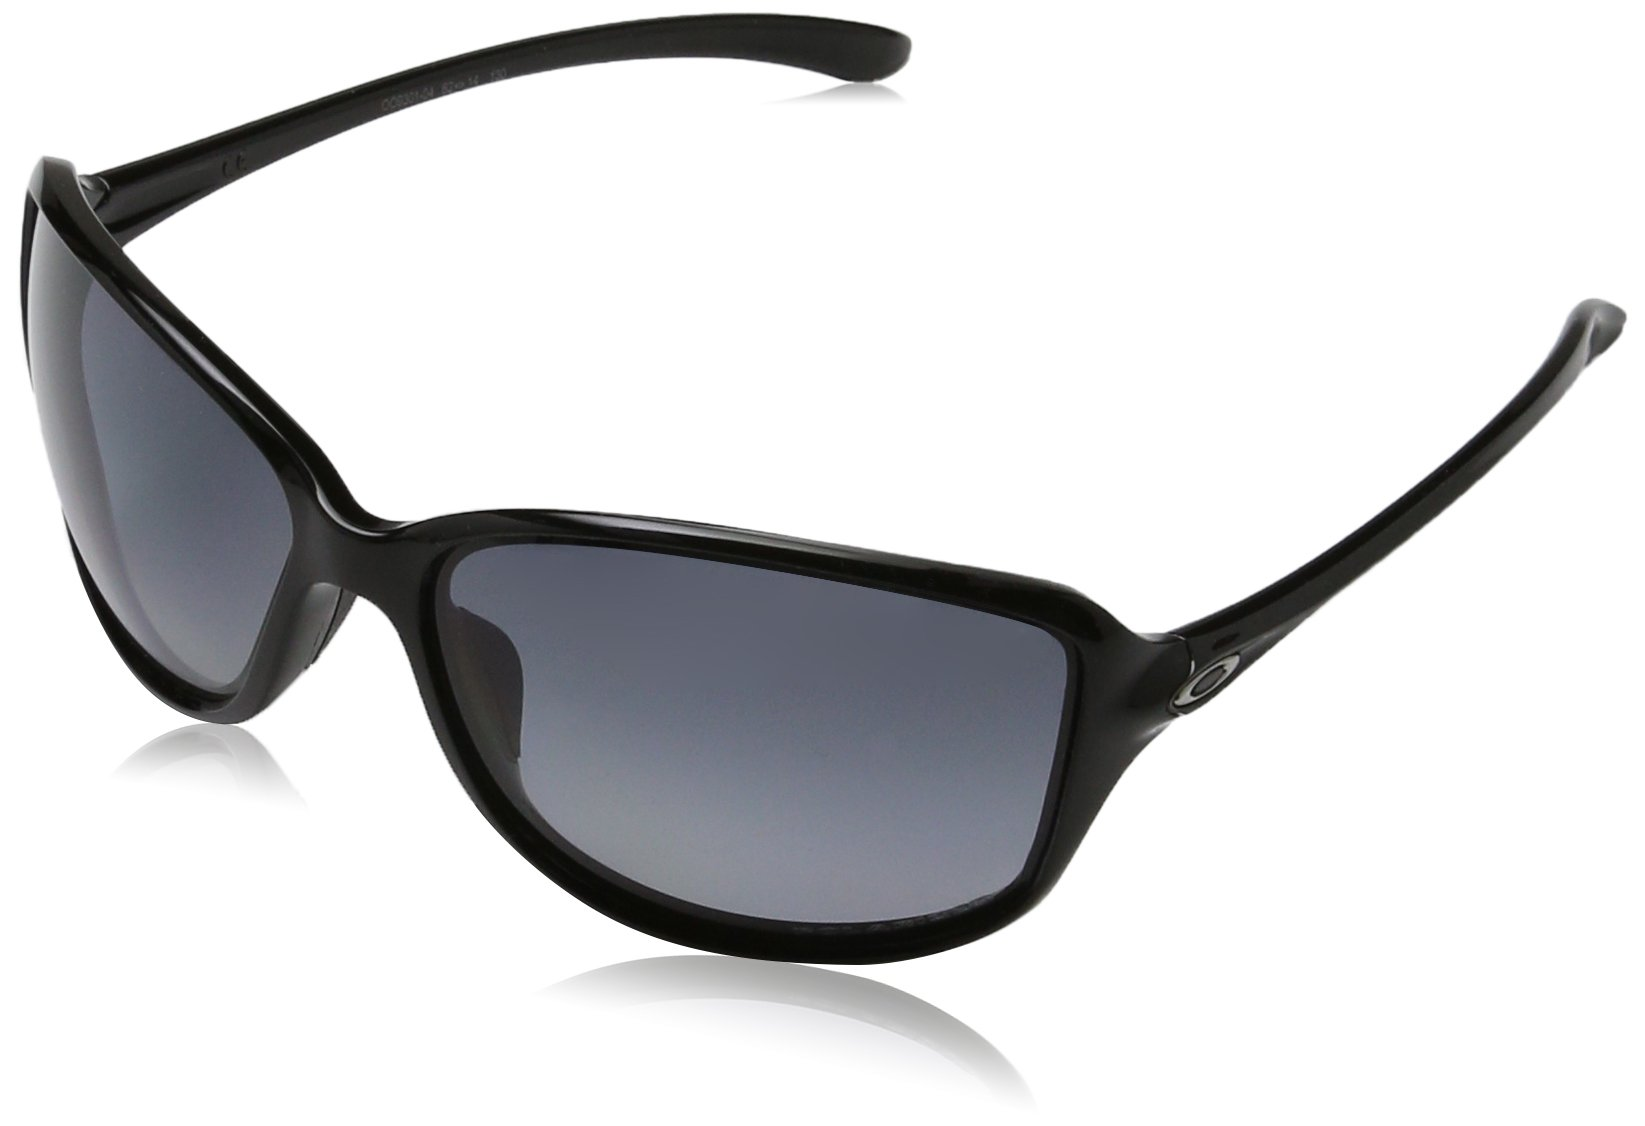 Oakley Women's OO9301 Cohort Rectangular Sunglasses, Polished Black/Grey Gradient Polarized, 62 mm